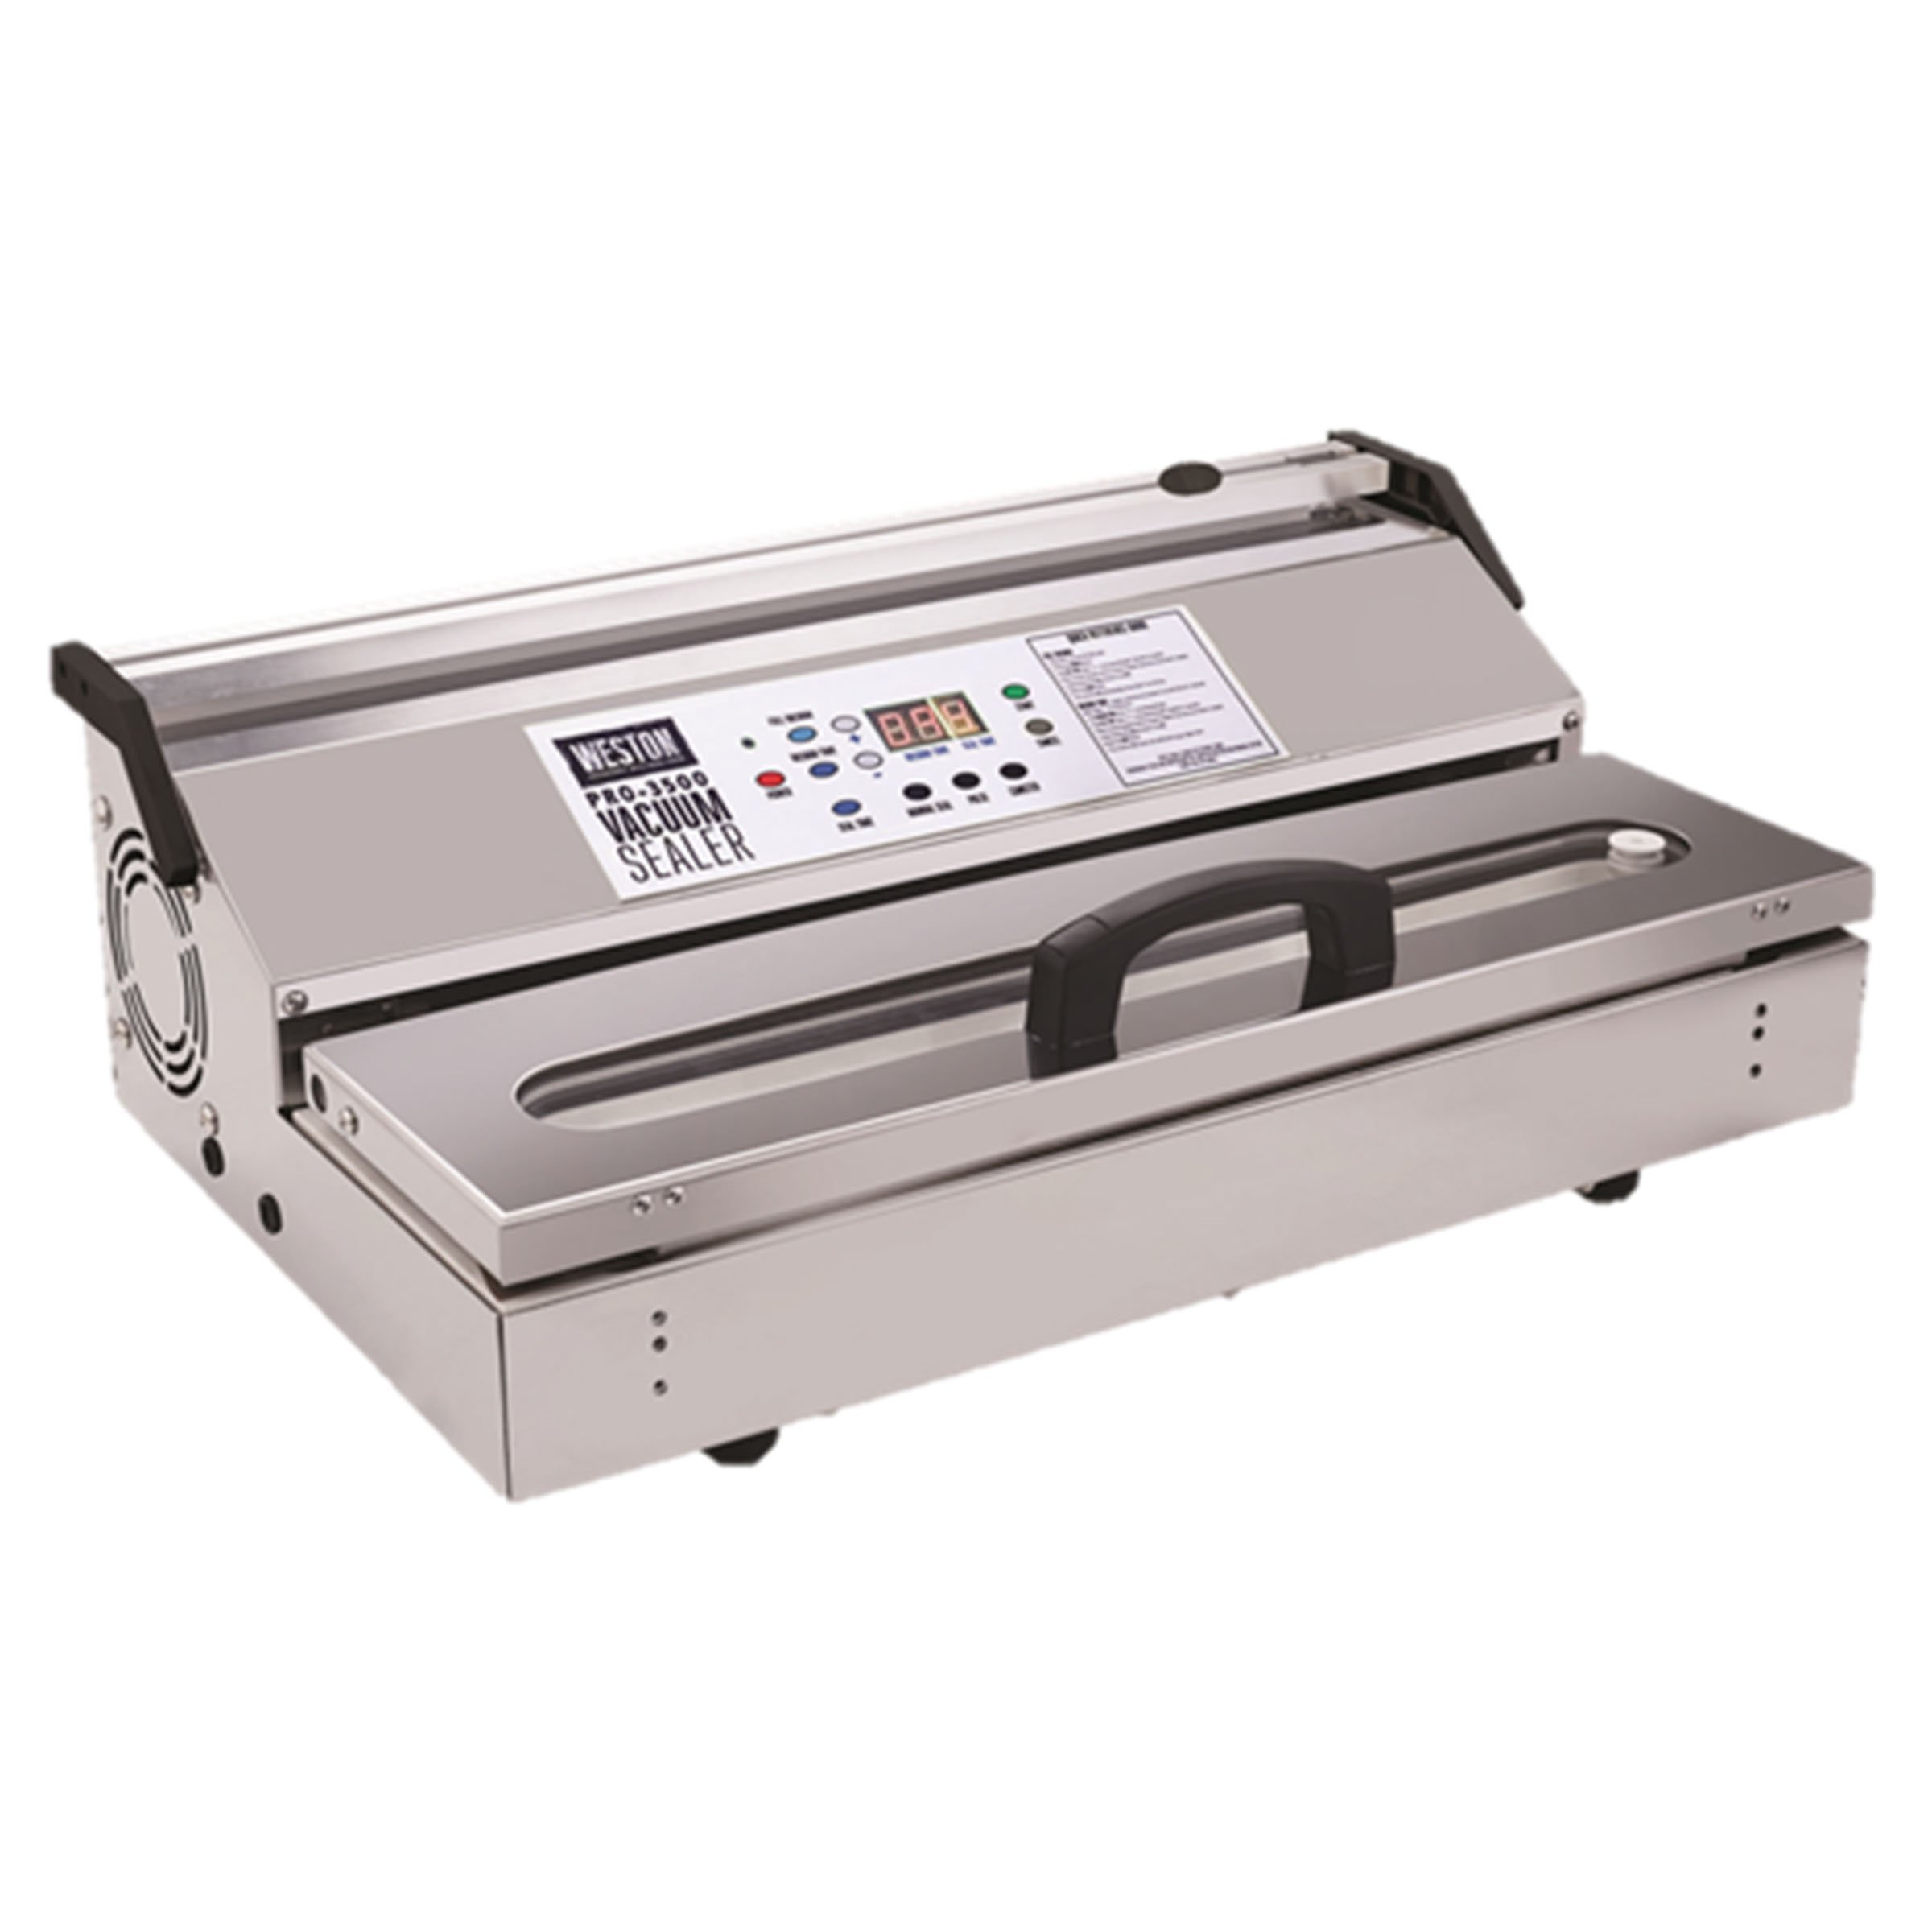 Weston 65-0901-w Pro-3500 Commercial Grade Vacuum Sealer, 15'' bar, Stainless Steel